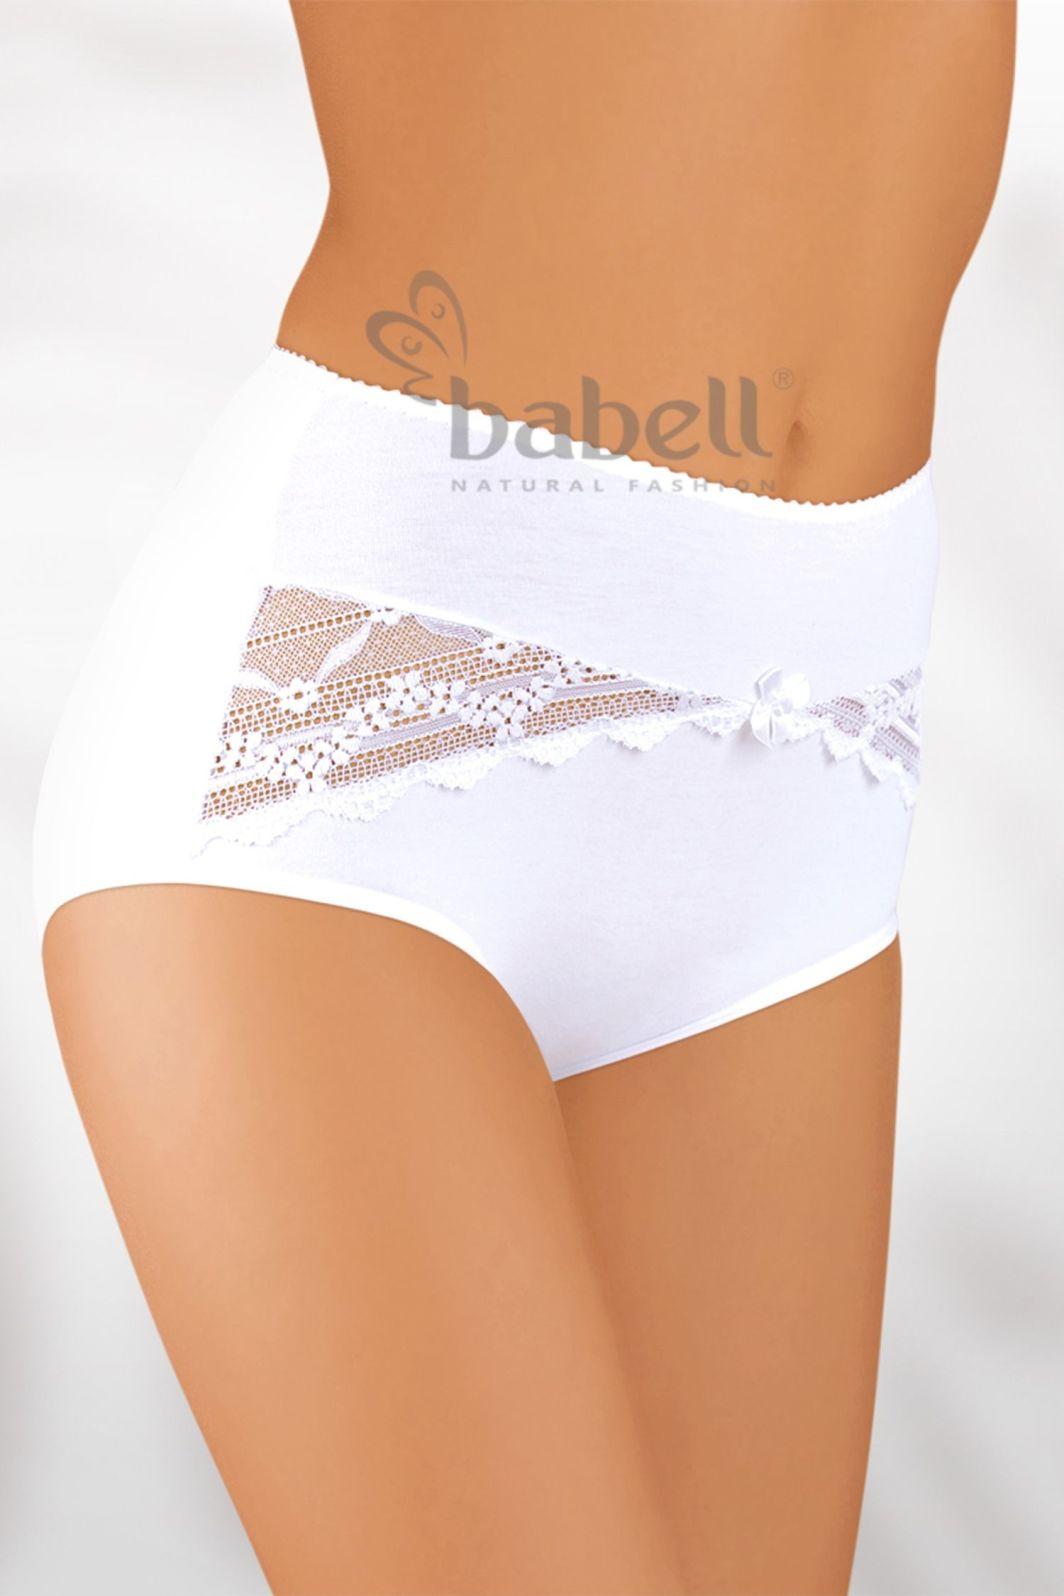 Babell Figi damskie BBL-004 białe r. L 1